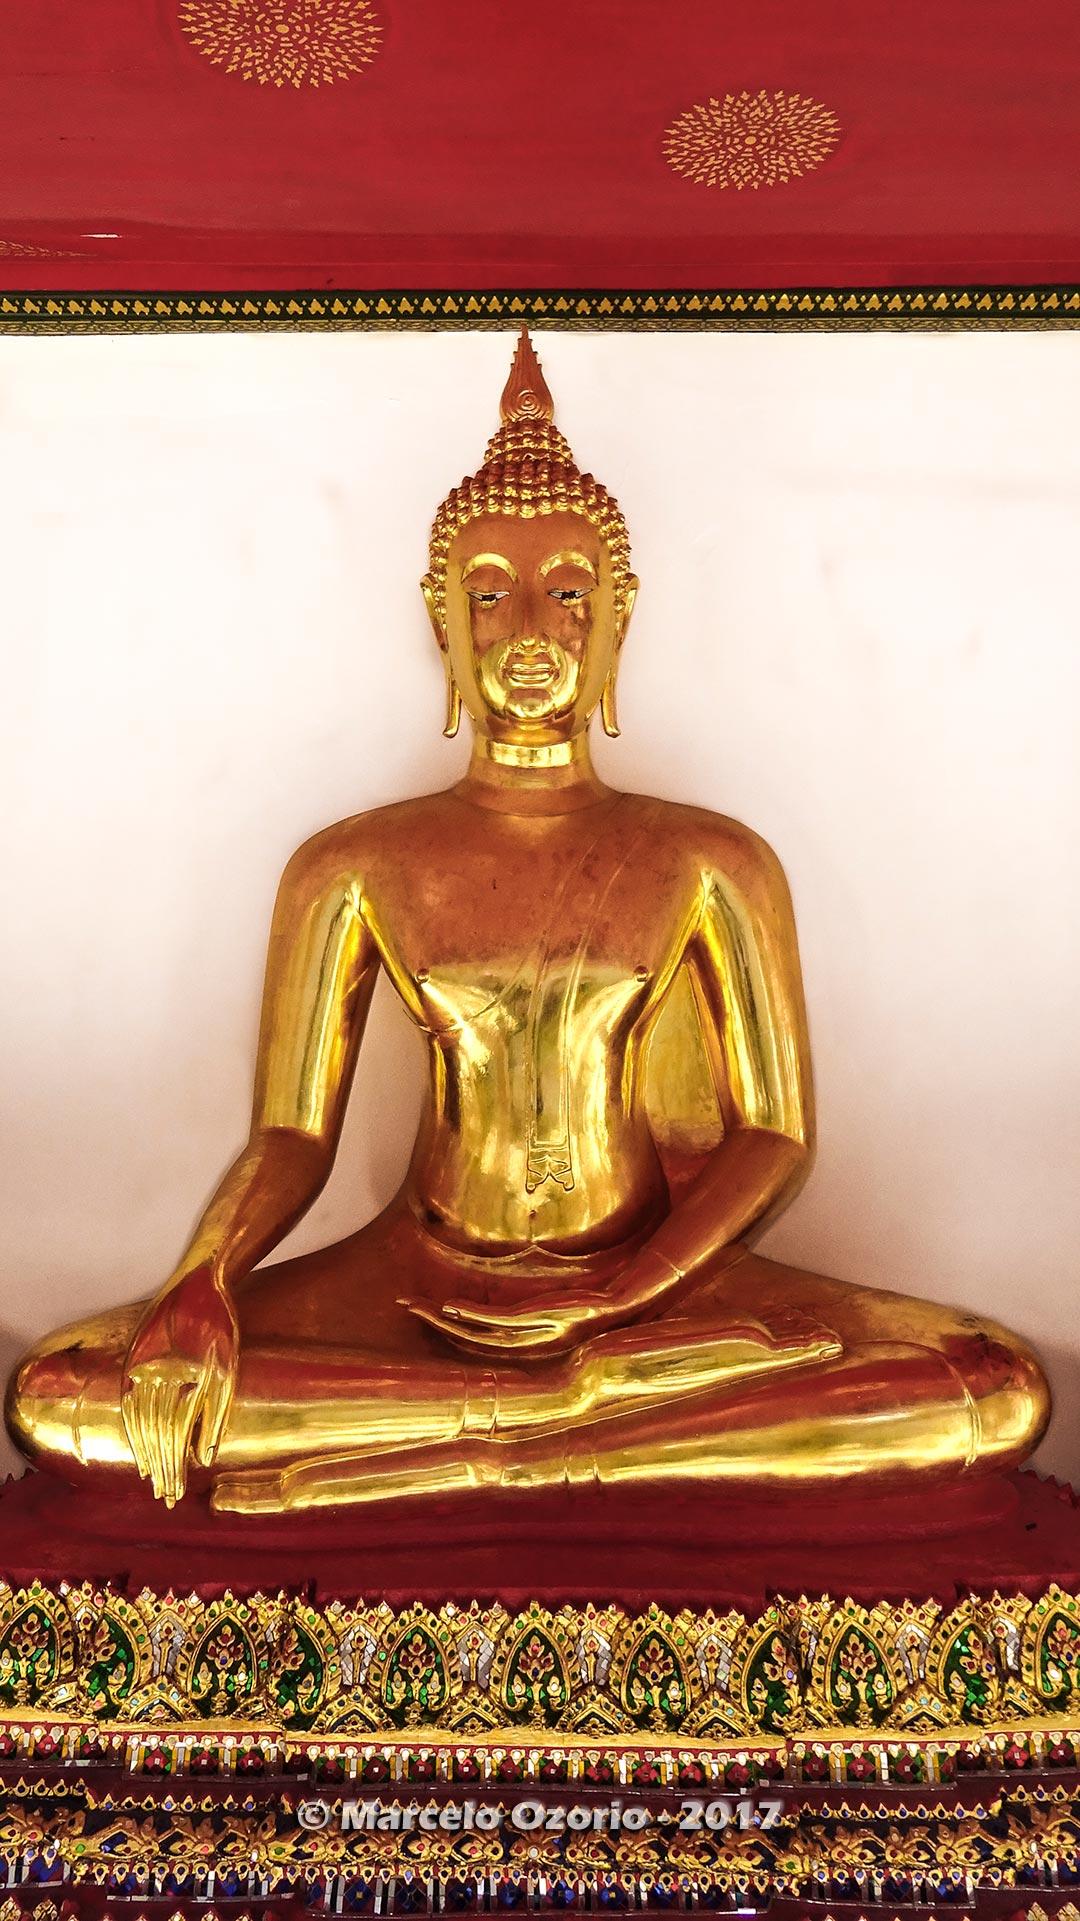 budhas bangkok thailand serie 27 - Buddhas of Bangkok - Thailand